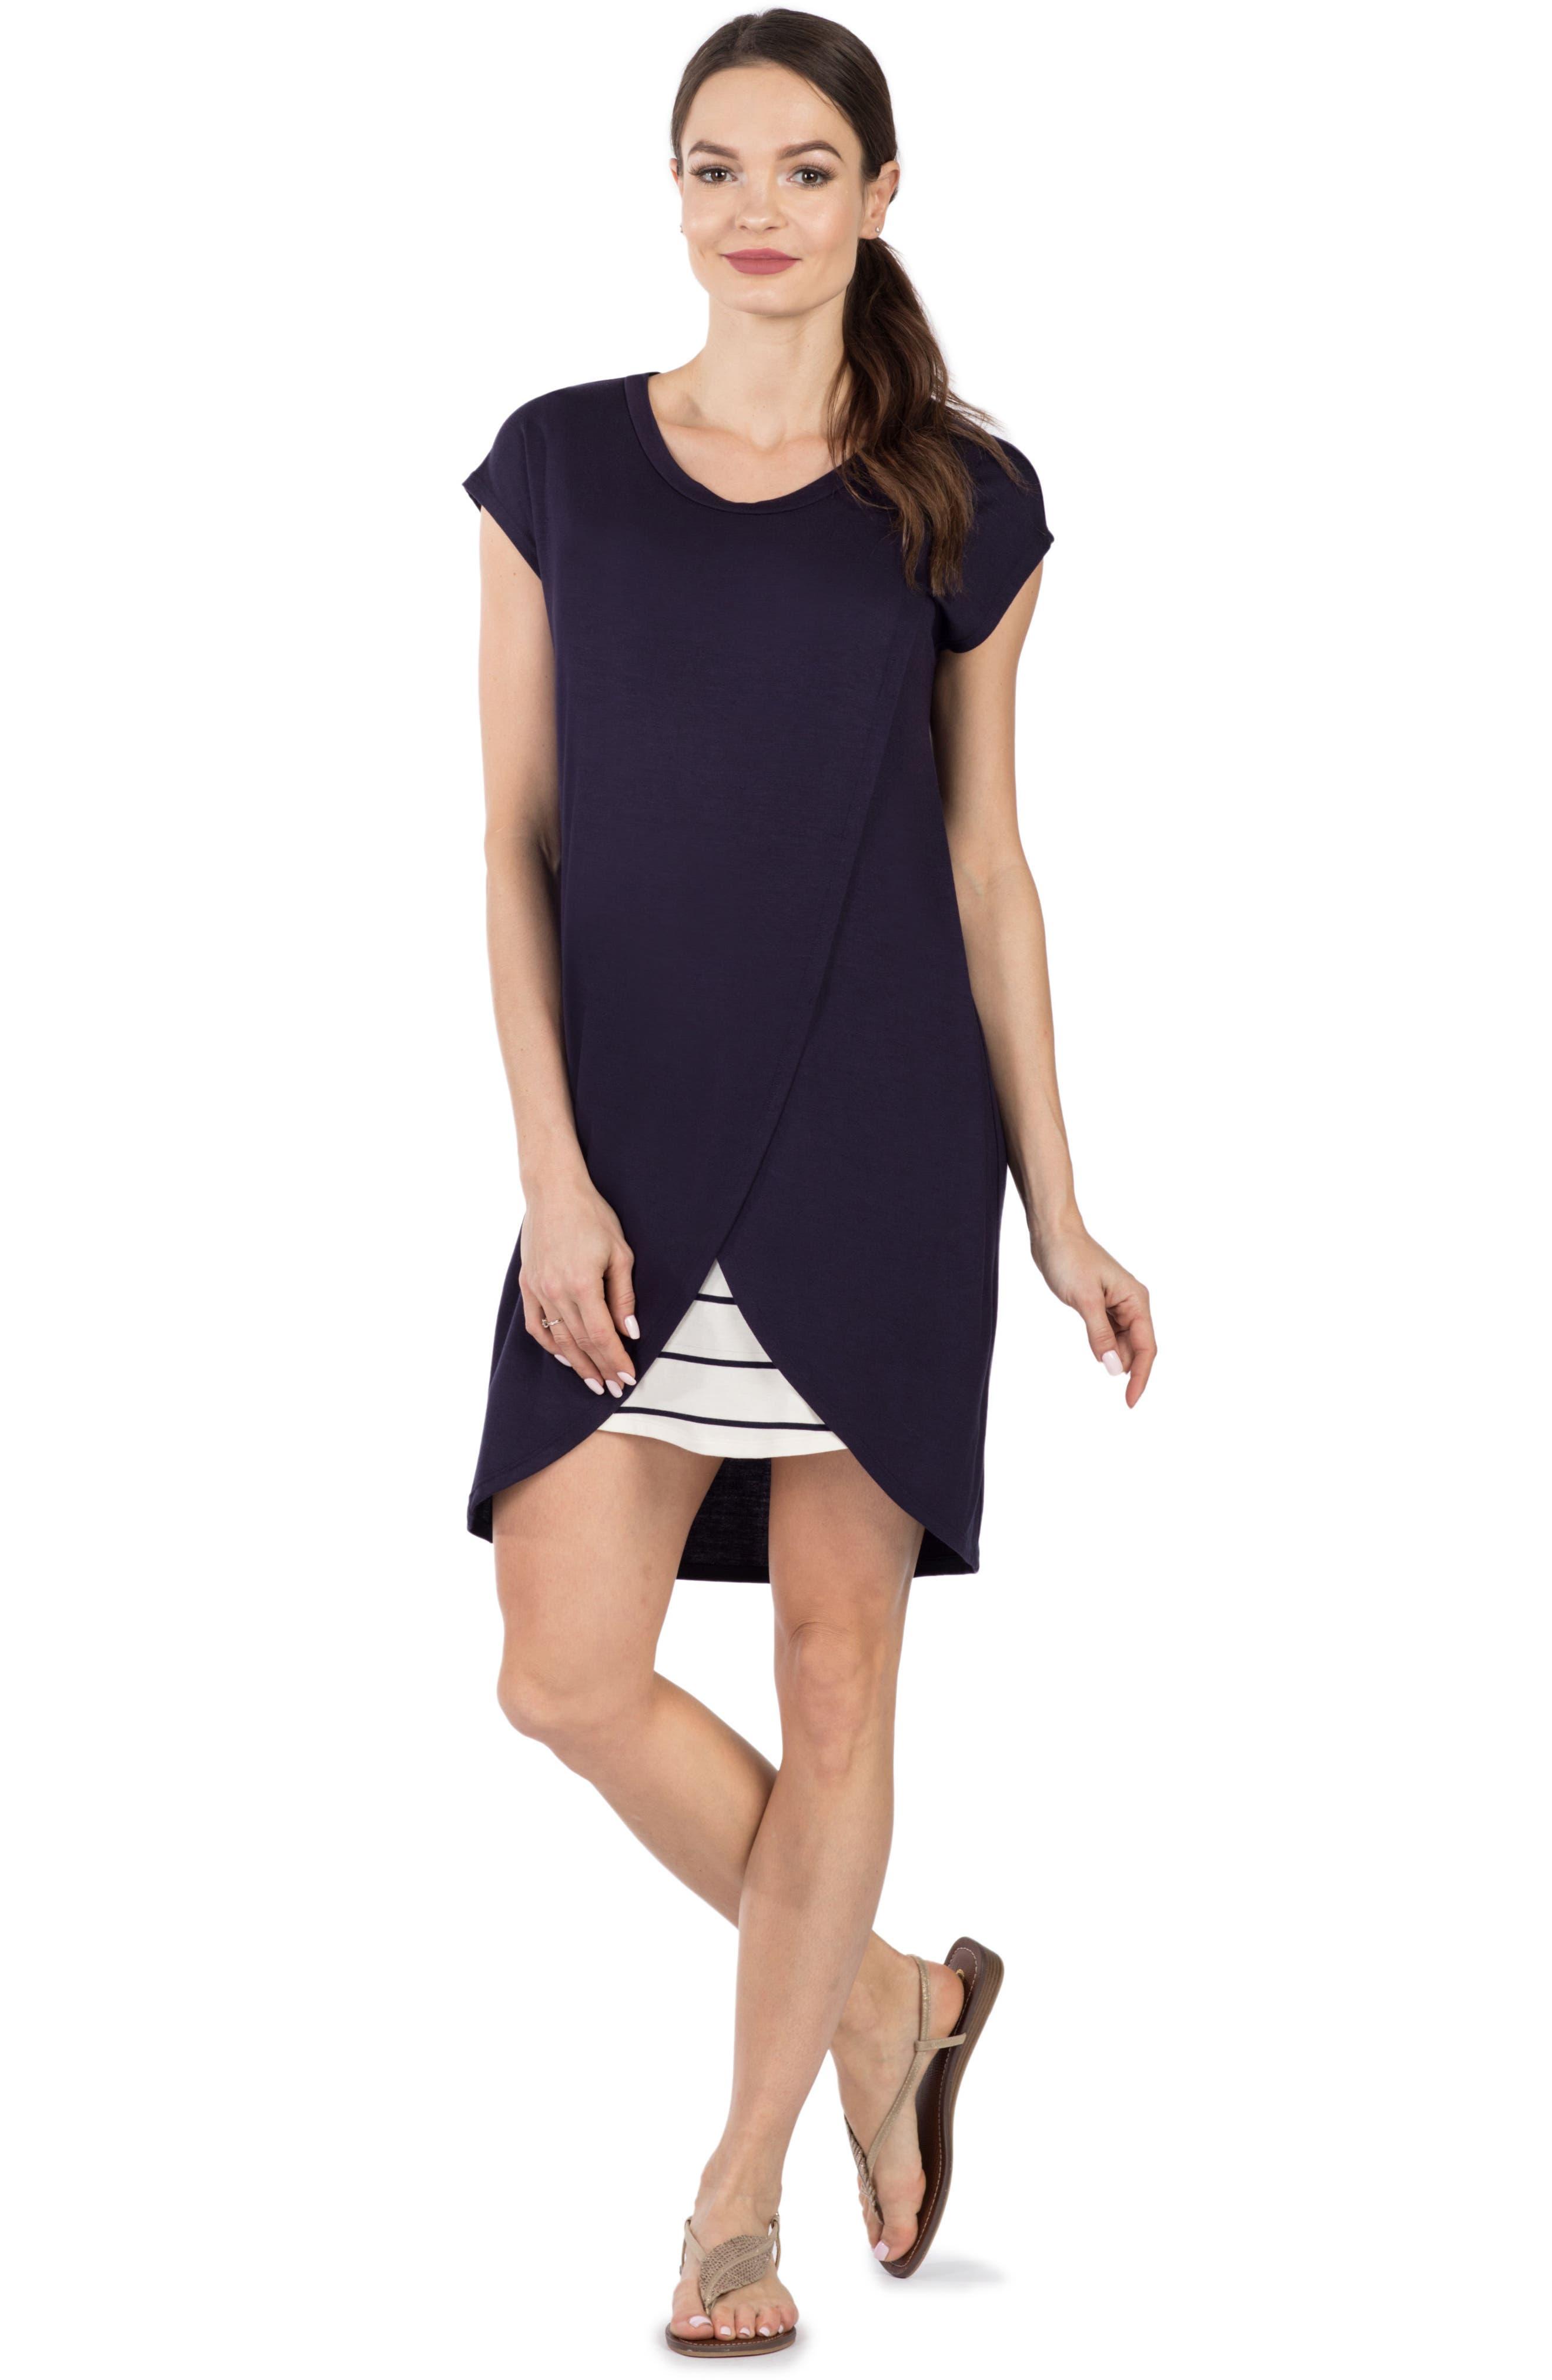 Lille Layered Maternity/Nursing Sheath Dress,                             Alternate thumbnail 4, color,                             NAVY/ WHITE STRIPE